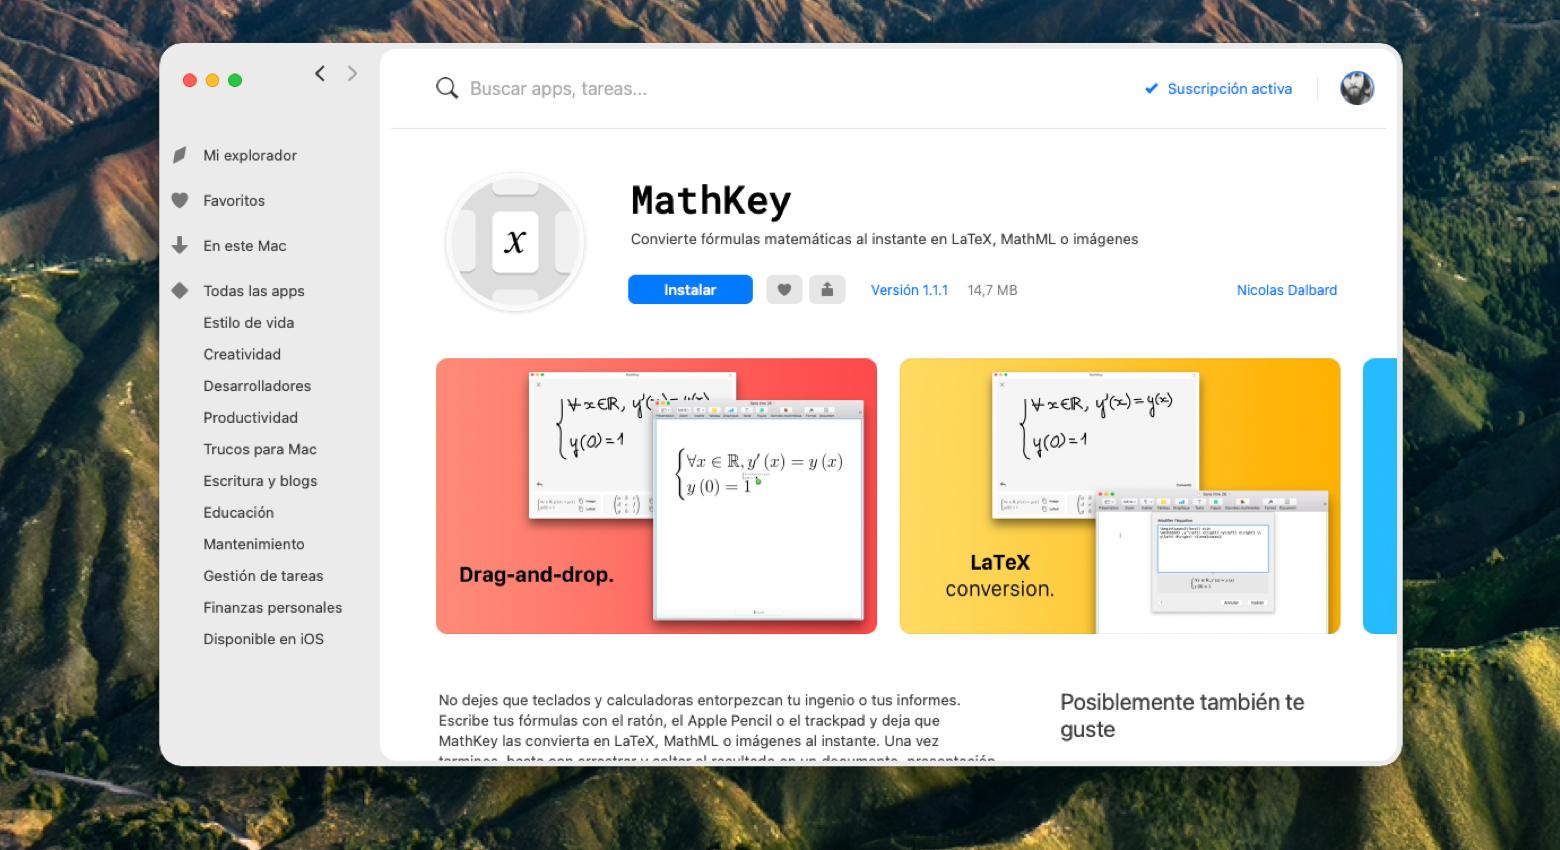 MathKey handwriting recognizer